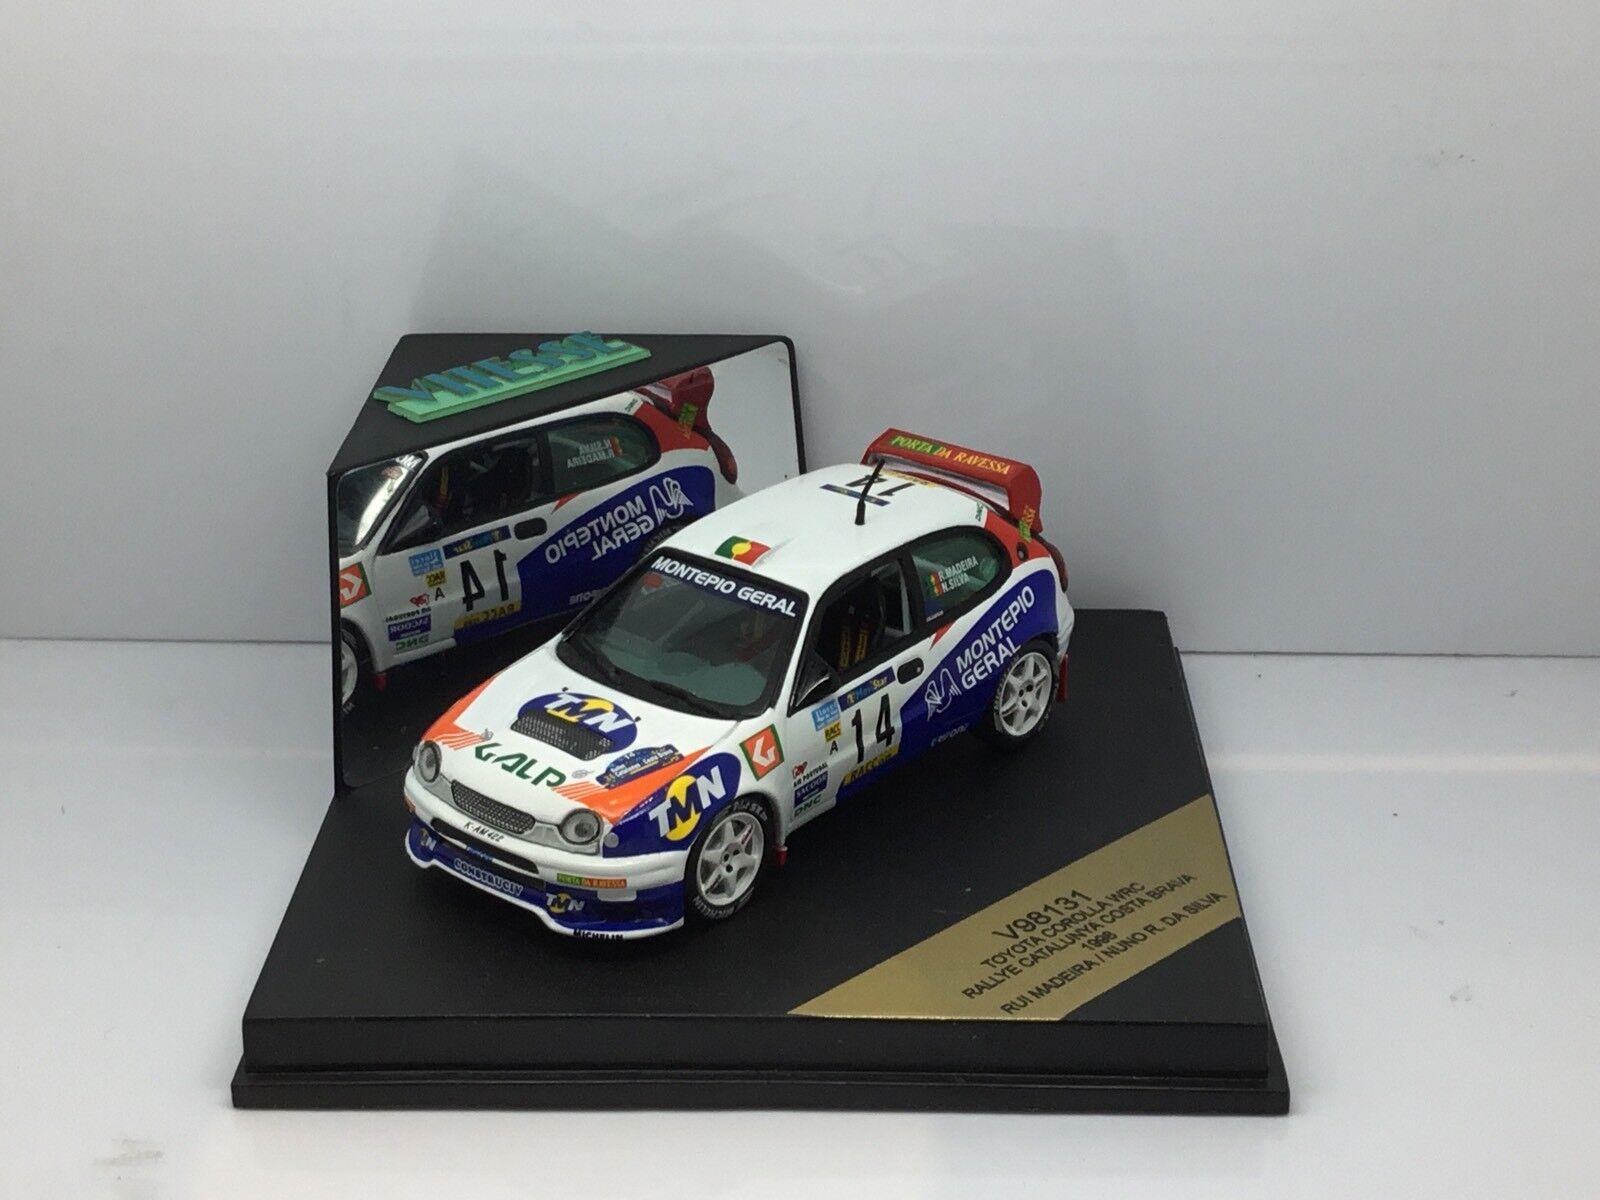 VITESSE V98131 TOYOTA CgoldLLA WRC RALLYE CATALUNYA COSTA BRAVA 1998